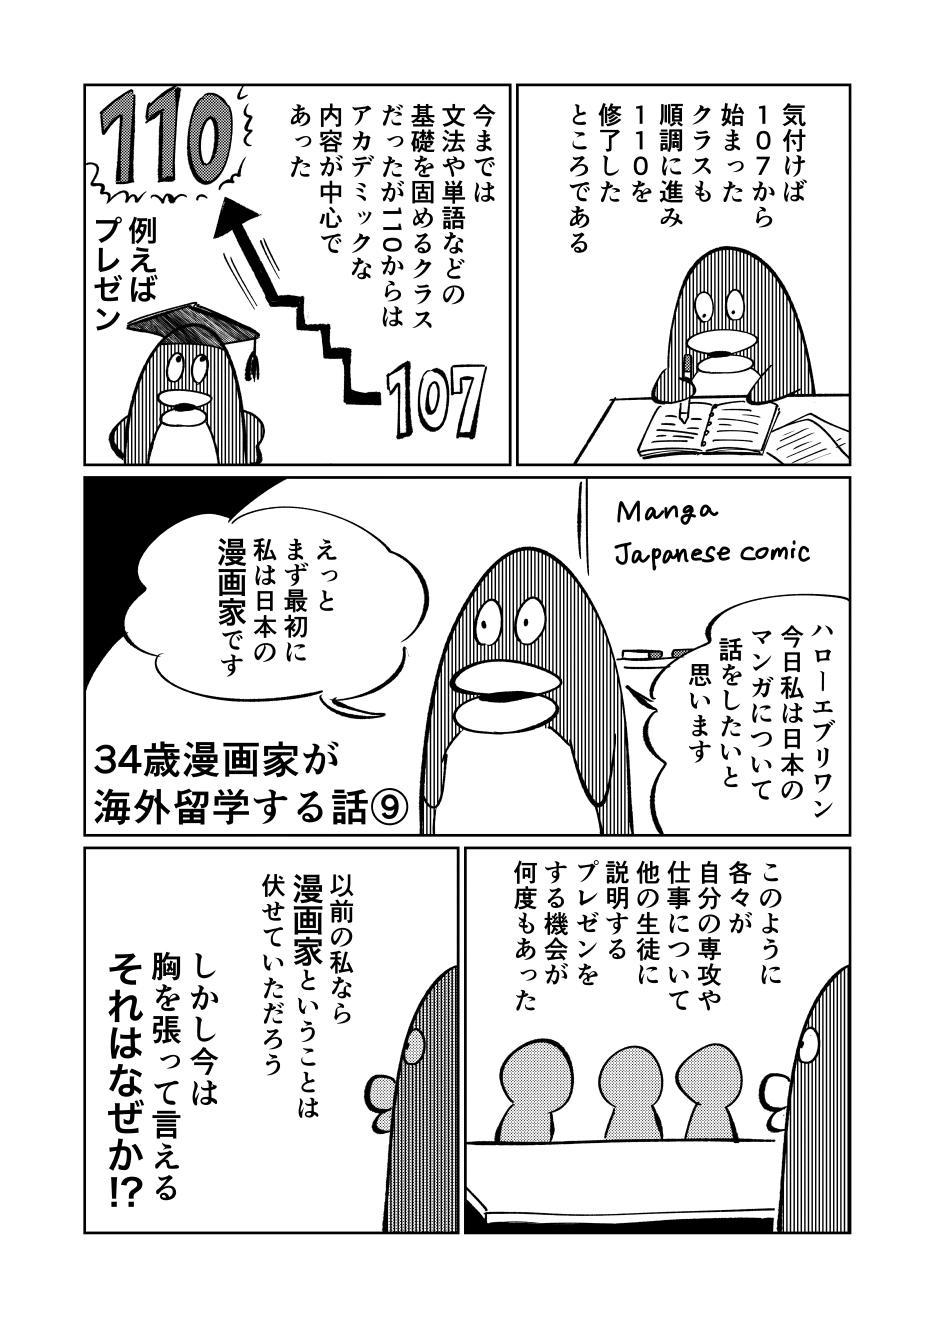 https://www.ryugaku.co.jp/blog/els_portland/upload/0901.jpg